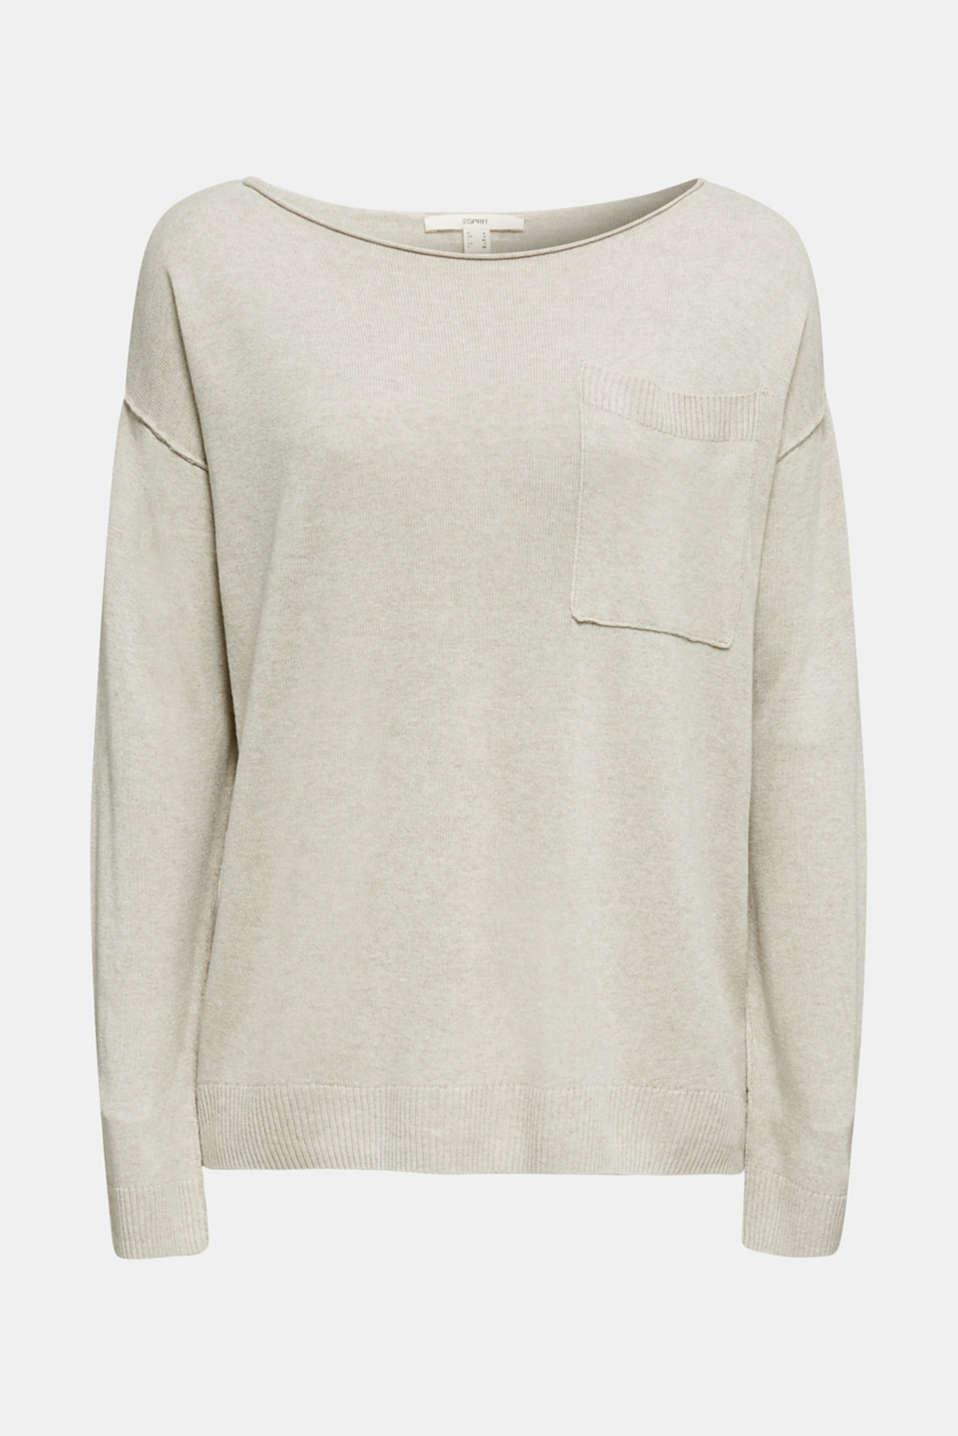 With linen: jumper with a pocket, LIGHT BEIGE, detail image number 4